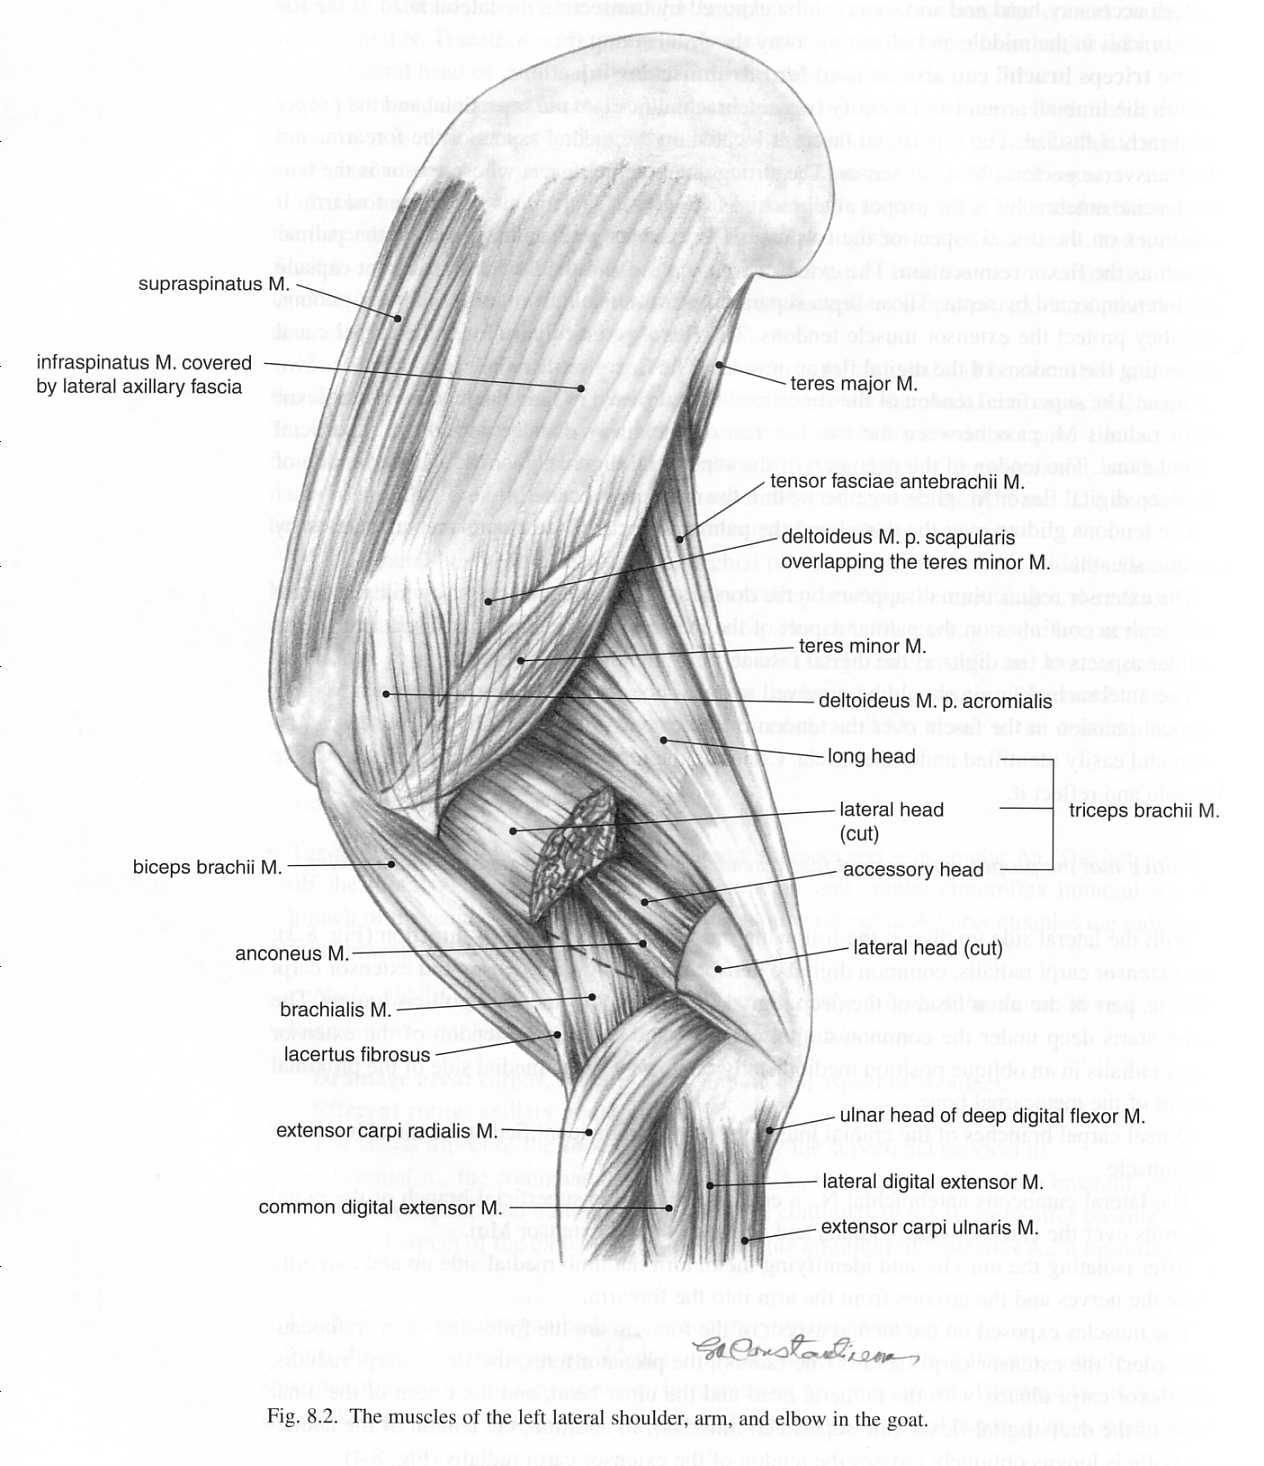 Goat Leg Bones Diagram - Wiring Diagram & Electricity Basics 101 •